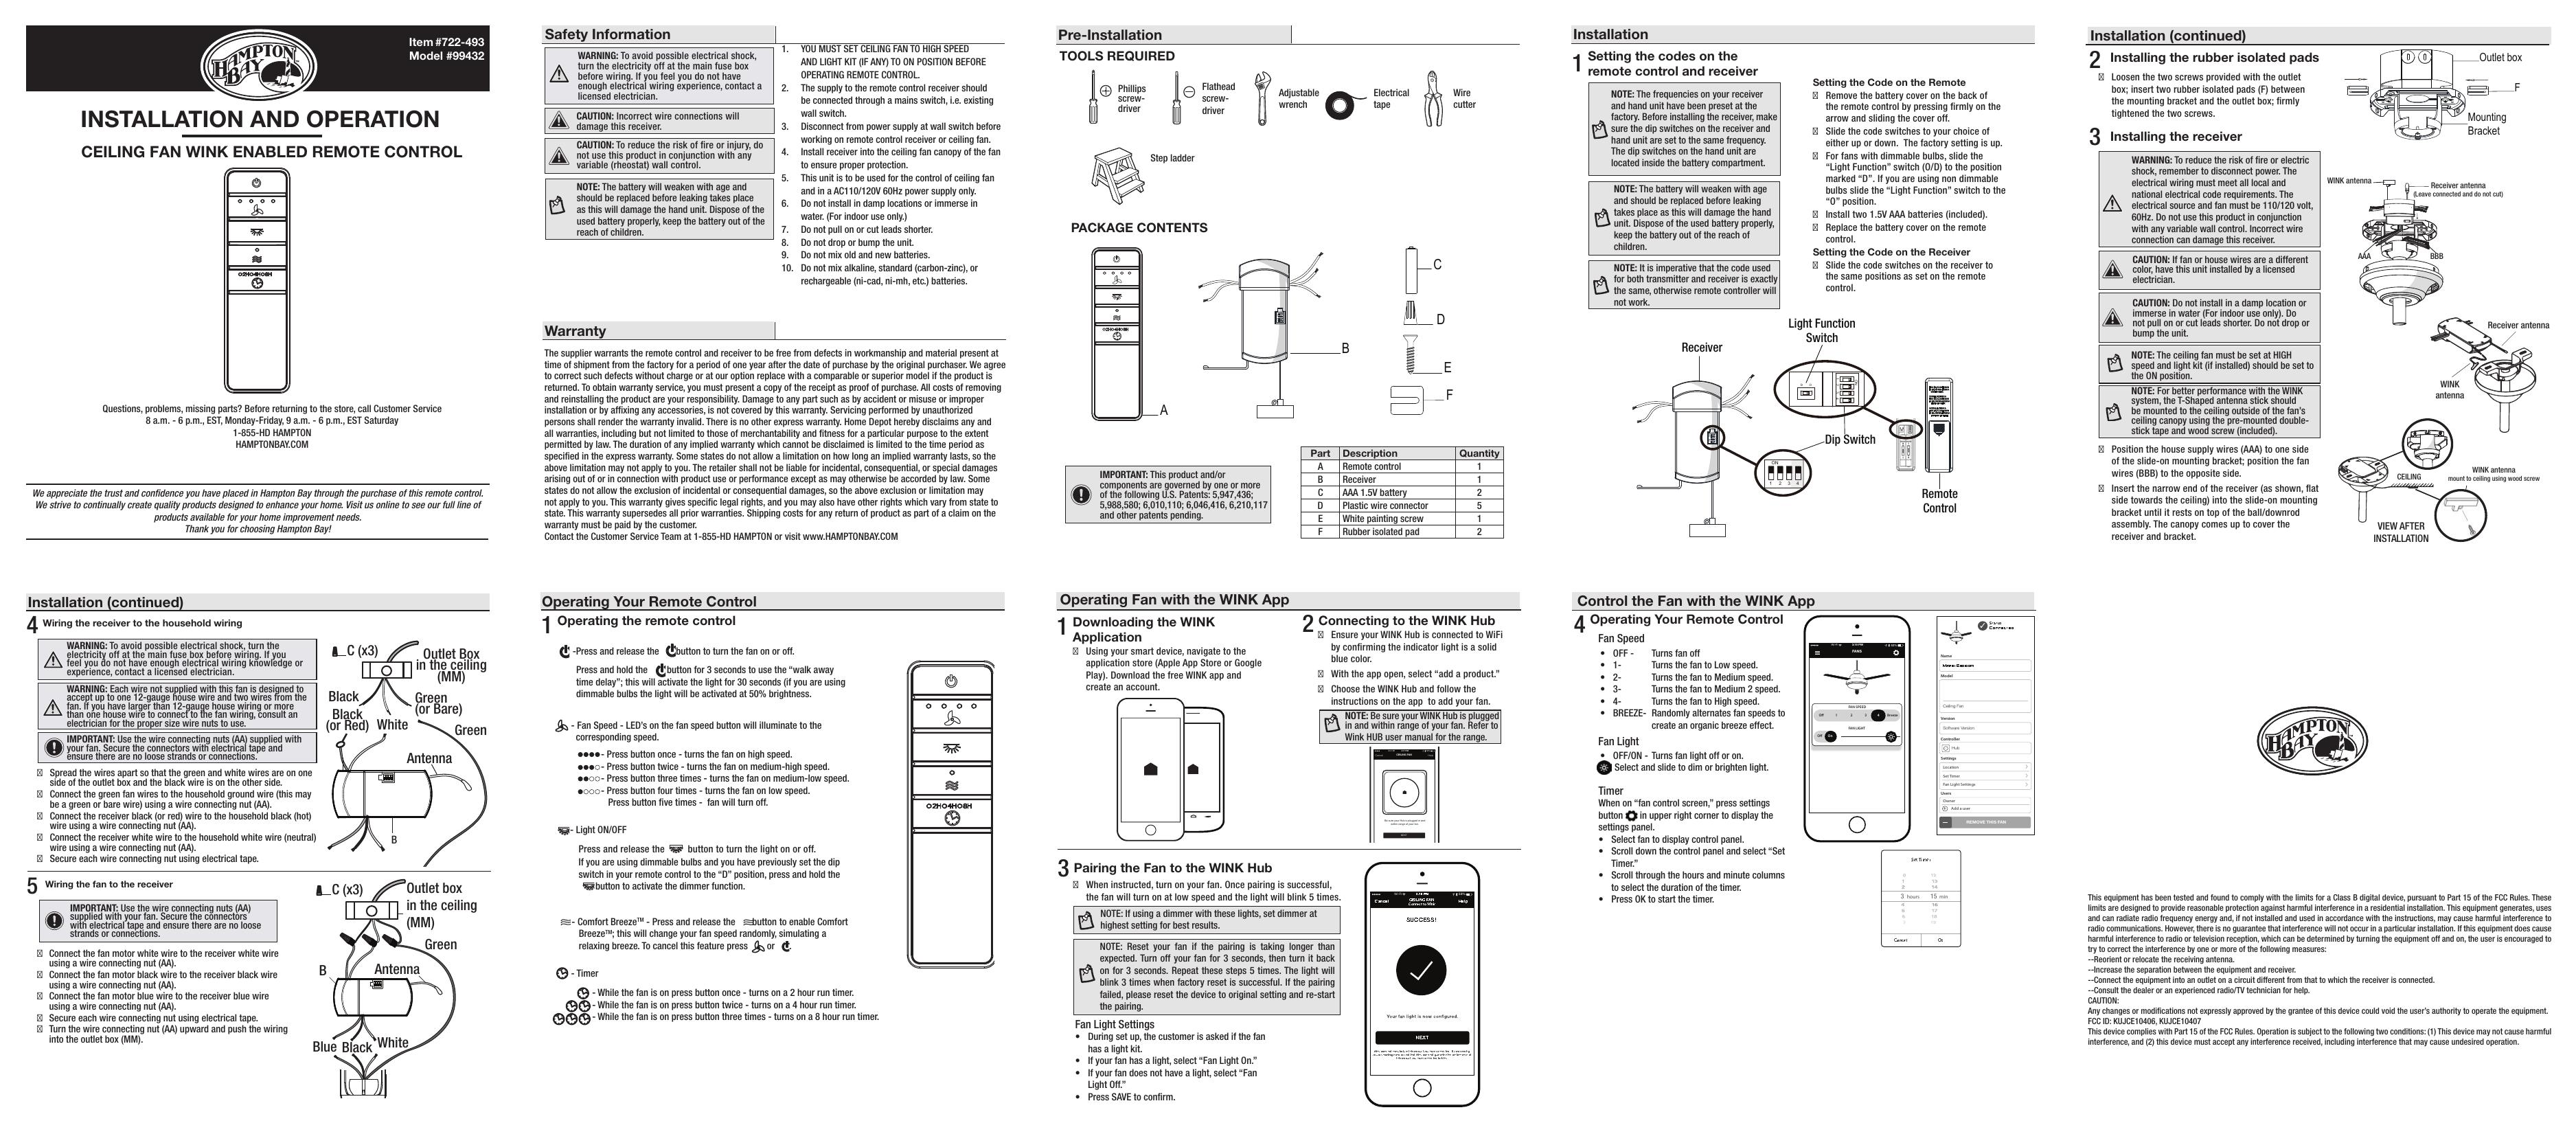 Hampton Bay 19912 Installation Guide Manualzz